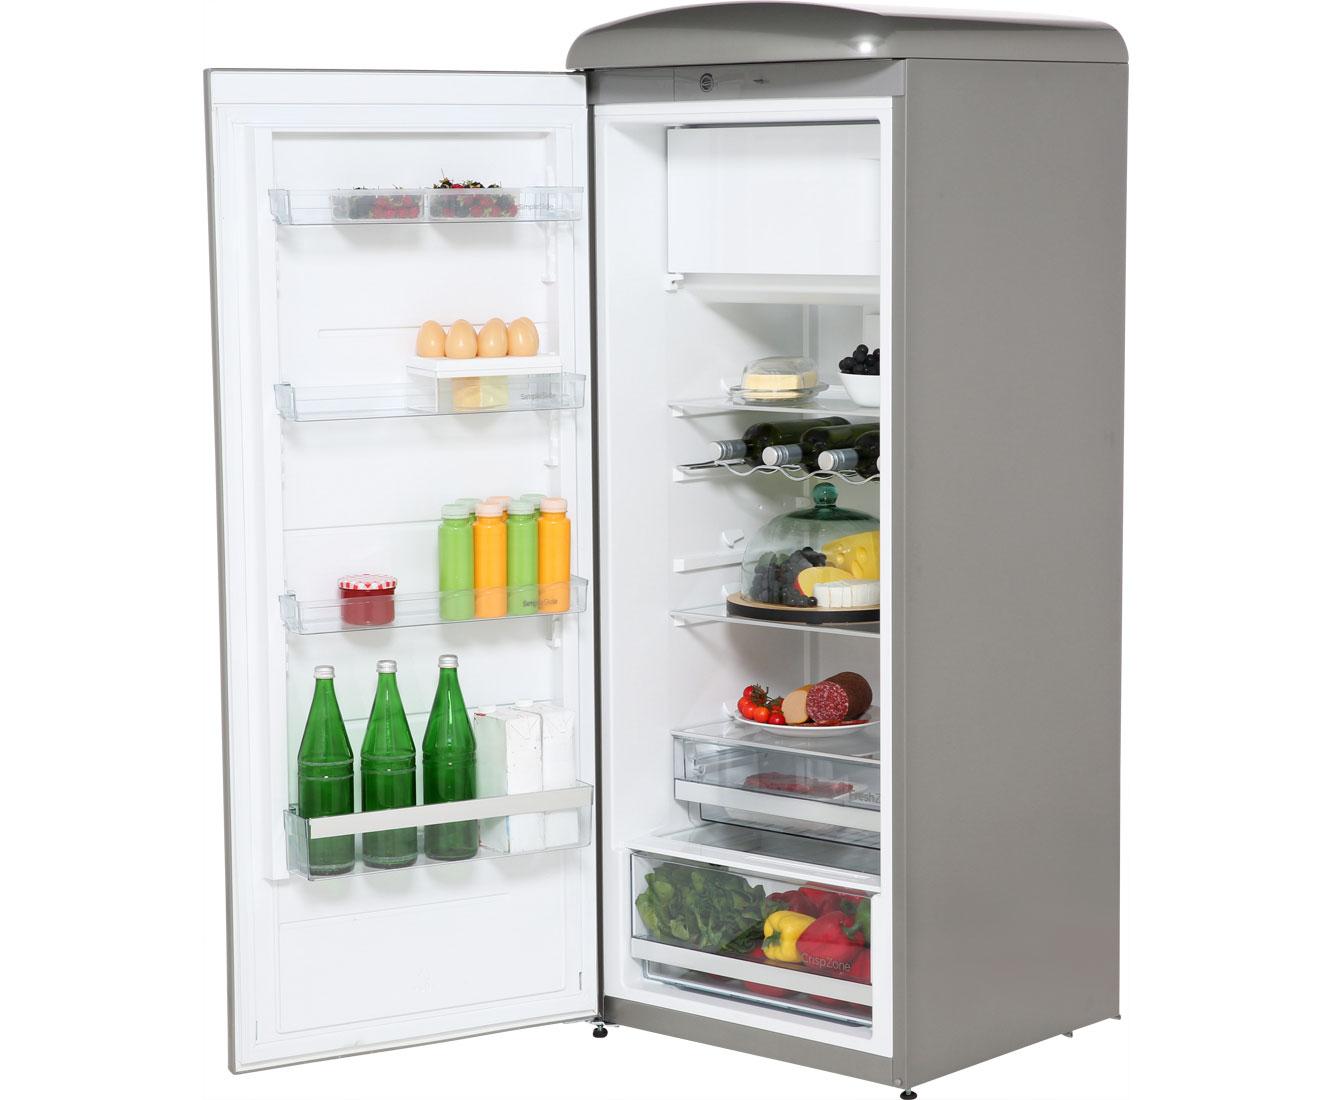 Amerikanischer Kühlschrank Bunt : Kühlschrank retro blau kühlschrank farbig